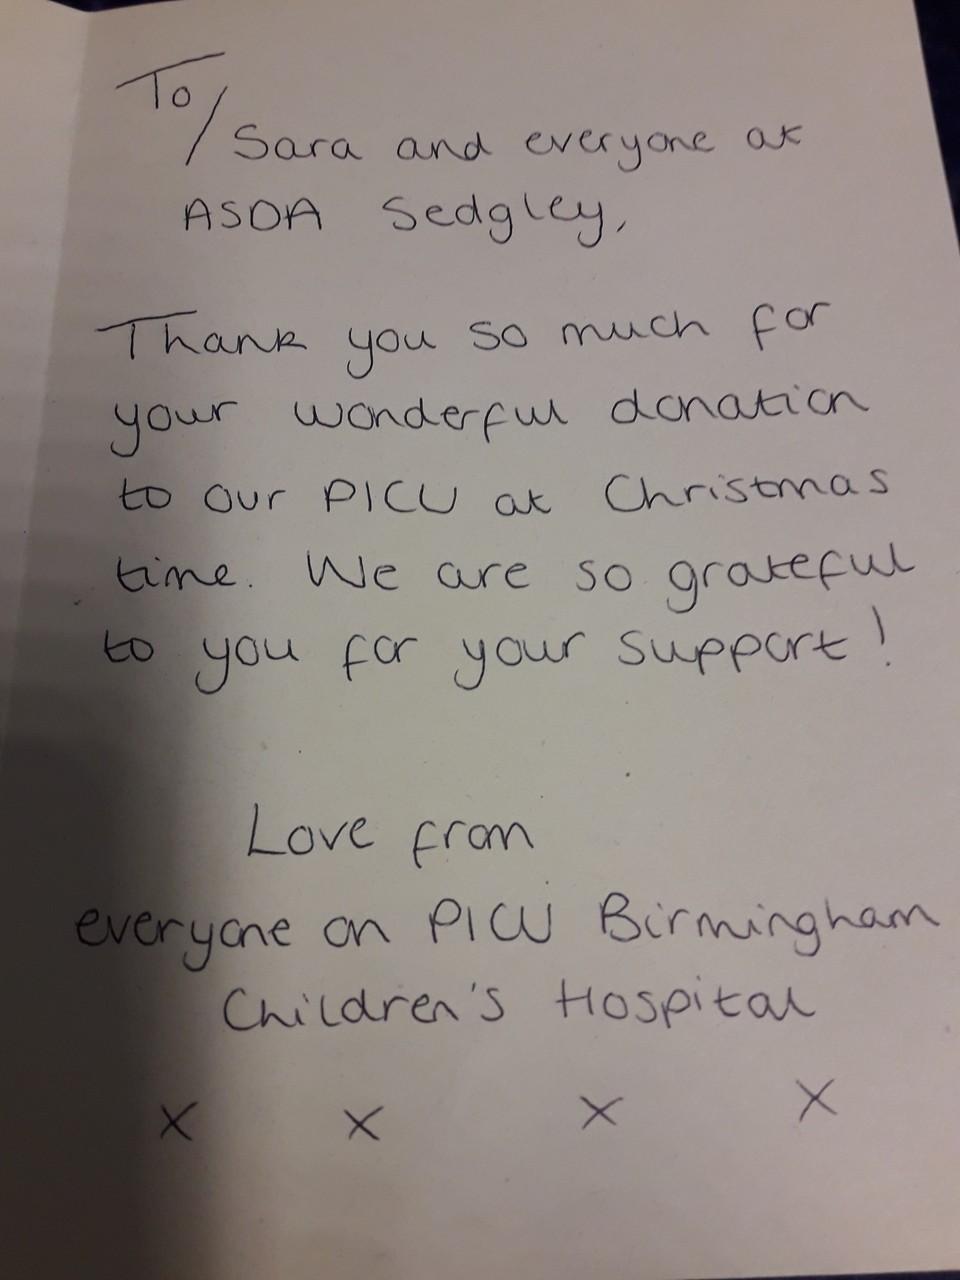 Christmas thanks from children's hospital | Asda Sedgley